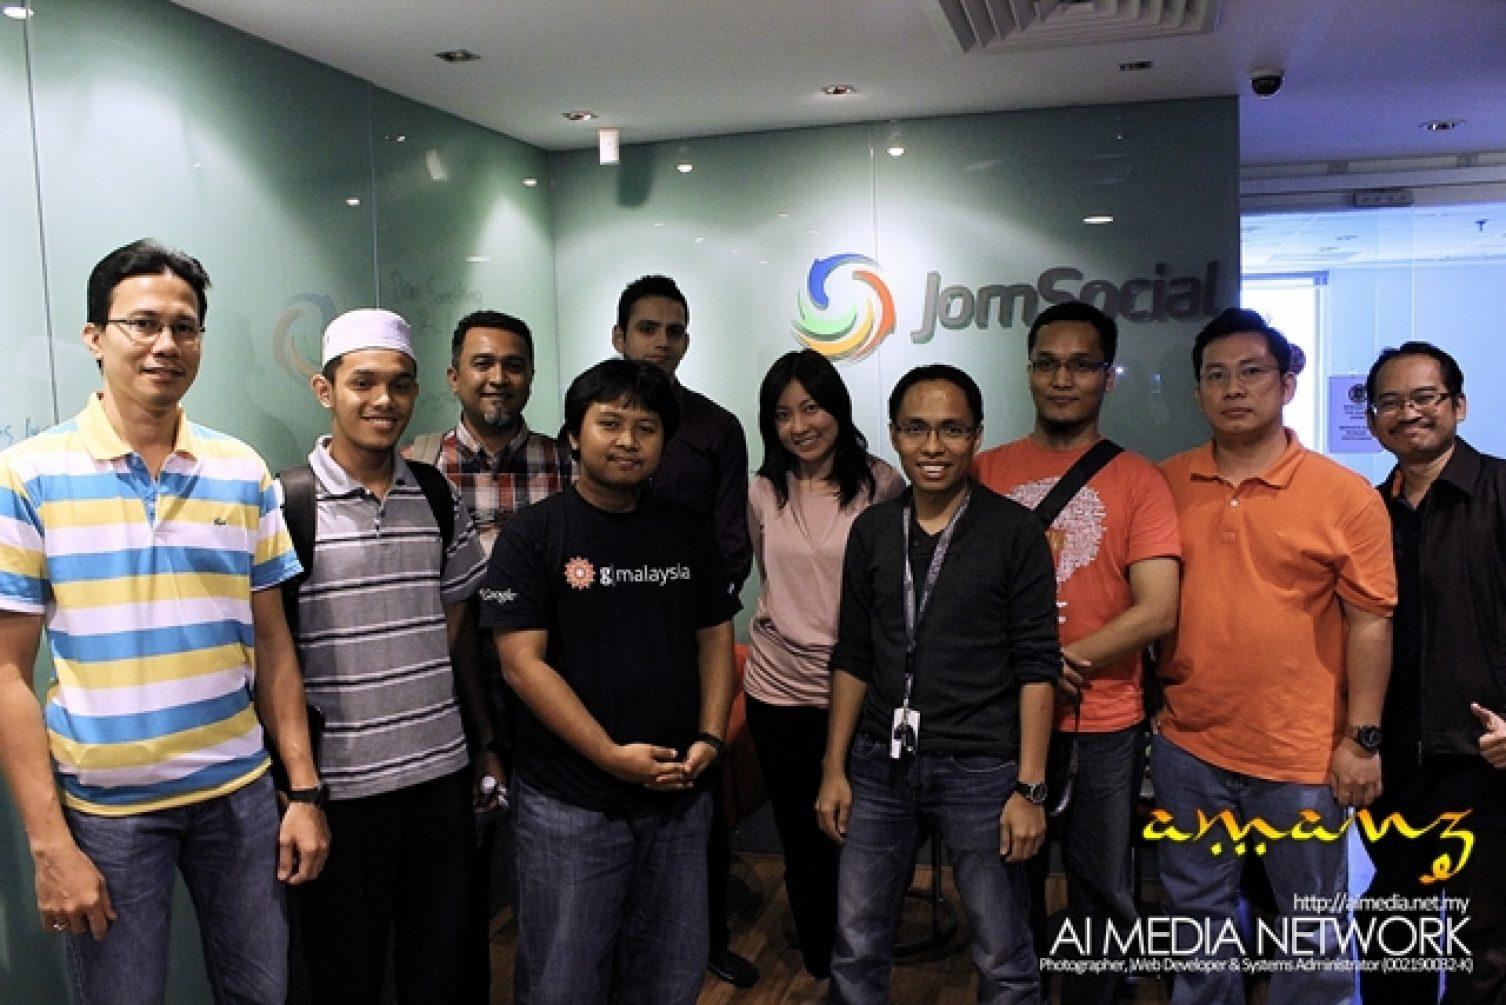 Antara peserta-peserta AMANZEDU.